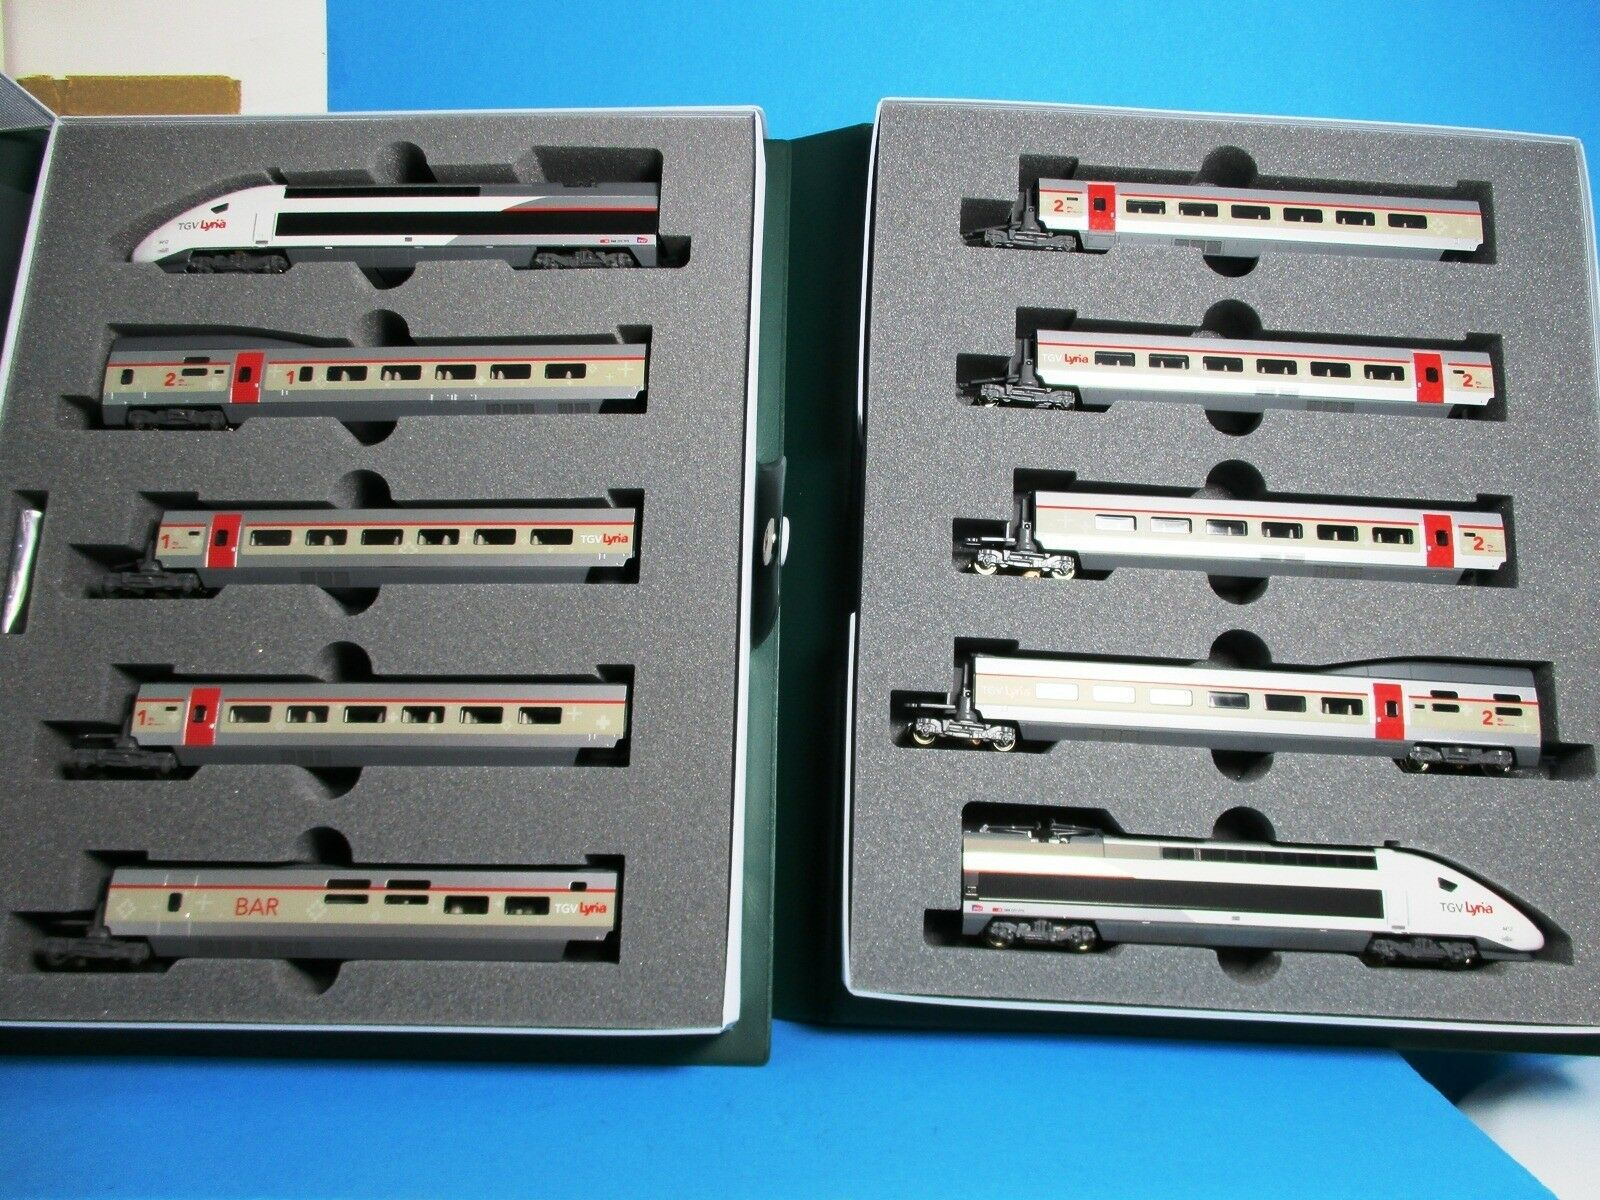 Kato k10-1325 SBB/SNCF TGV Zugset Lyria 10 pezzi, ANALOGICO, NUOVO, OVP, NEM, M 1:160,